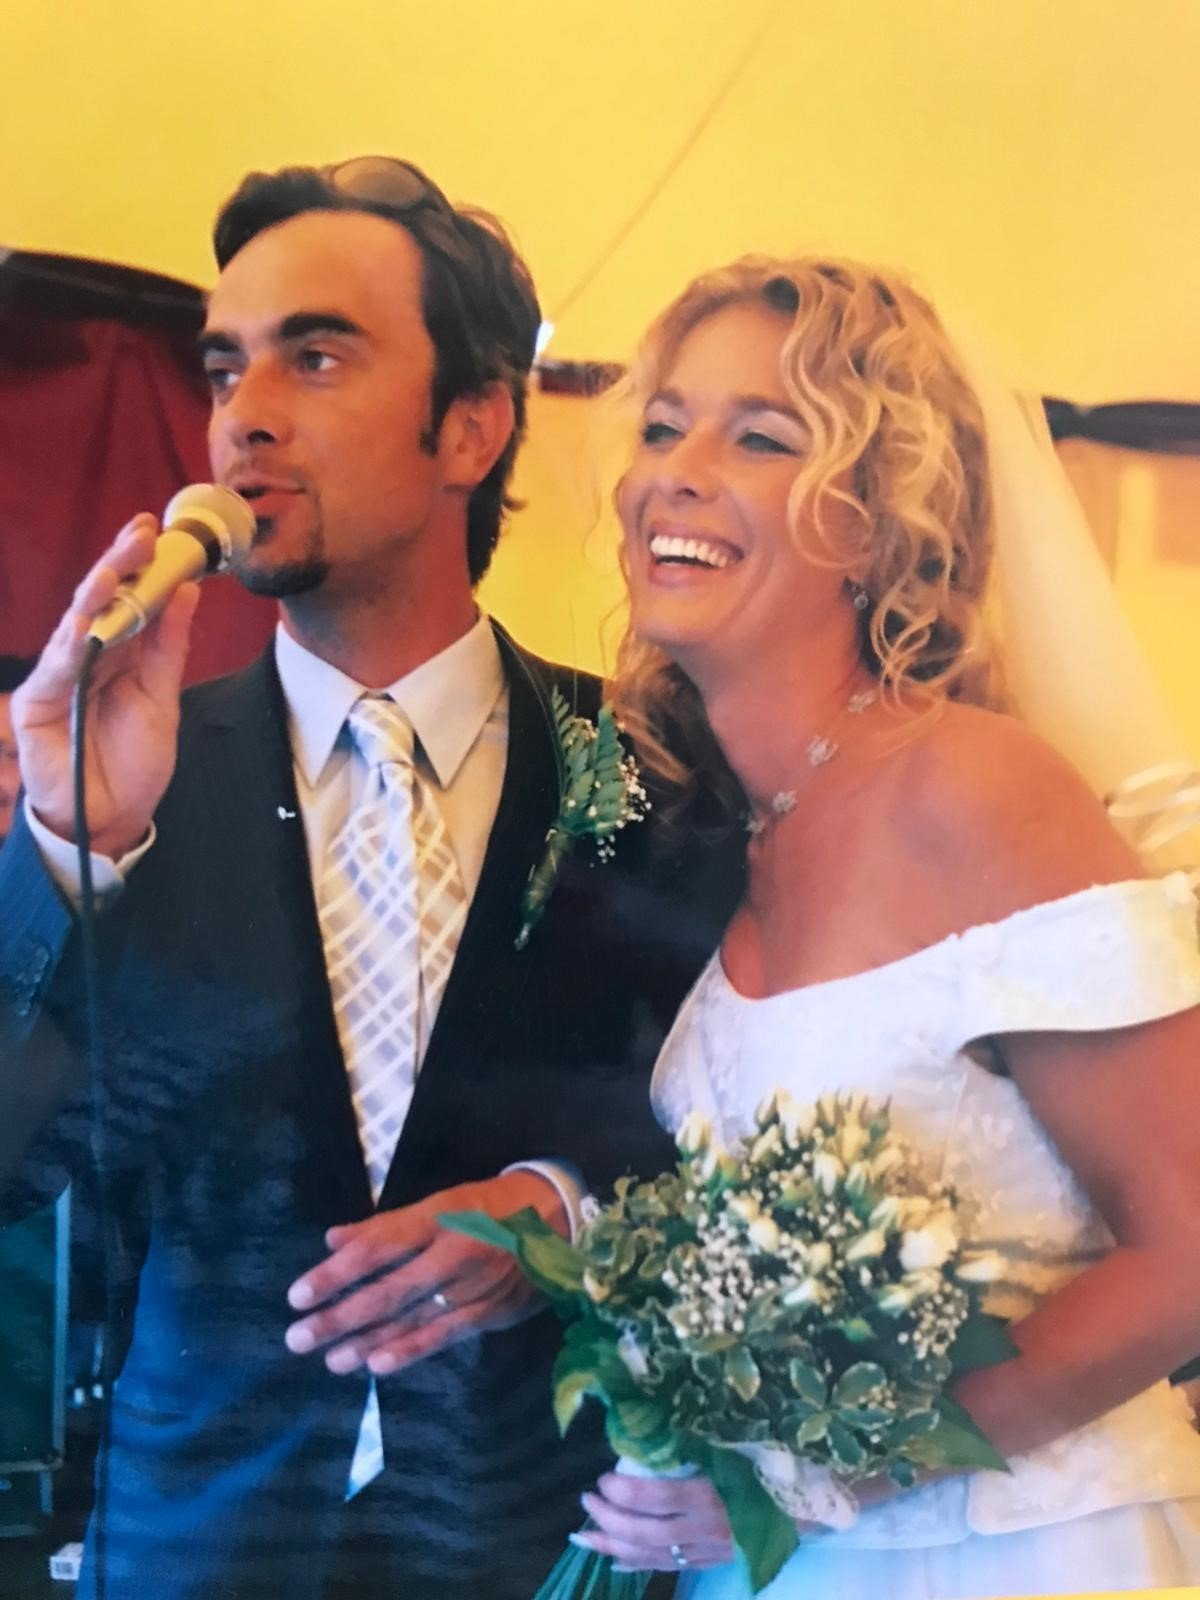 Svatba Tomáše Matonohy a Lucie Benešové.